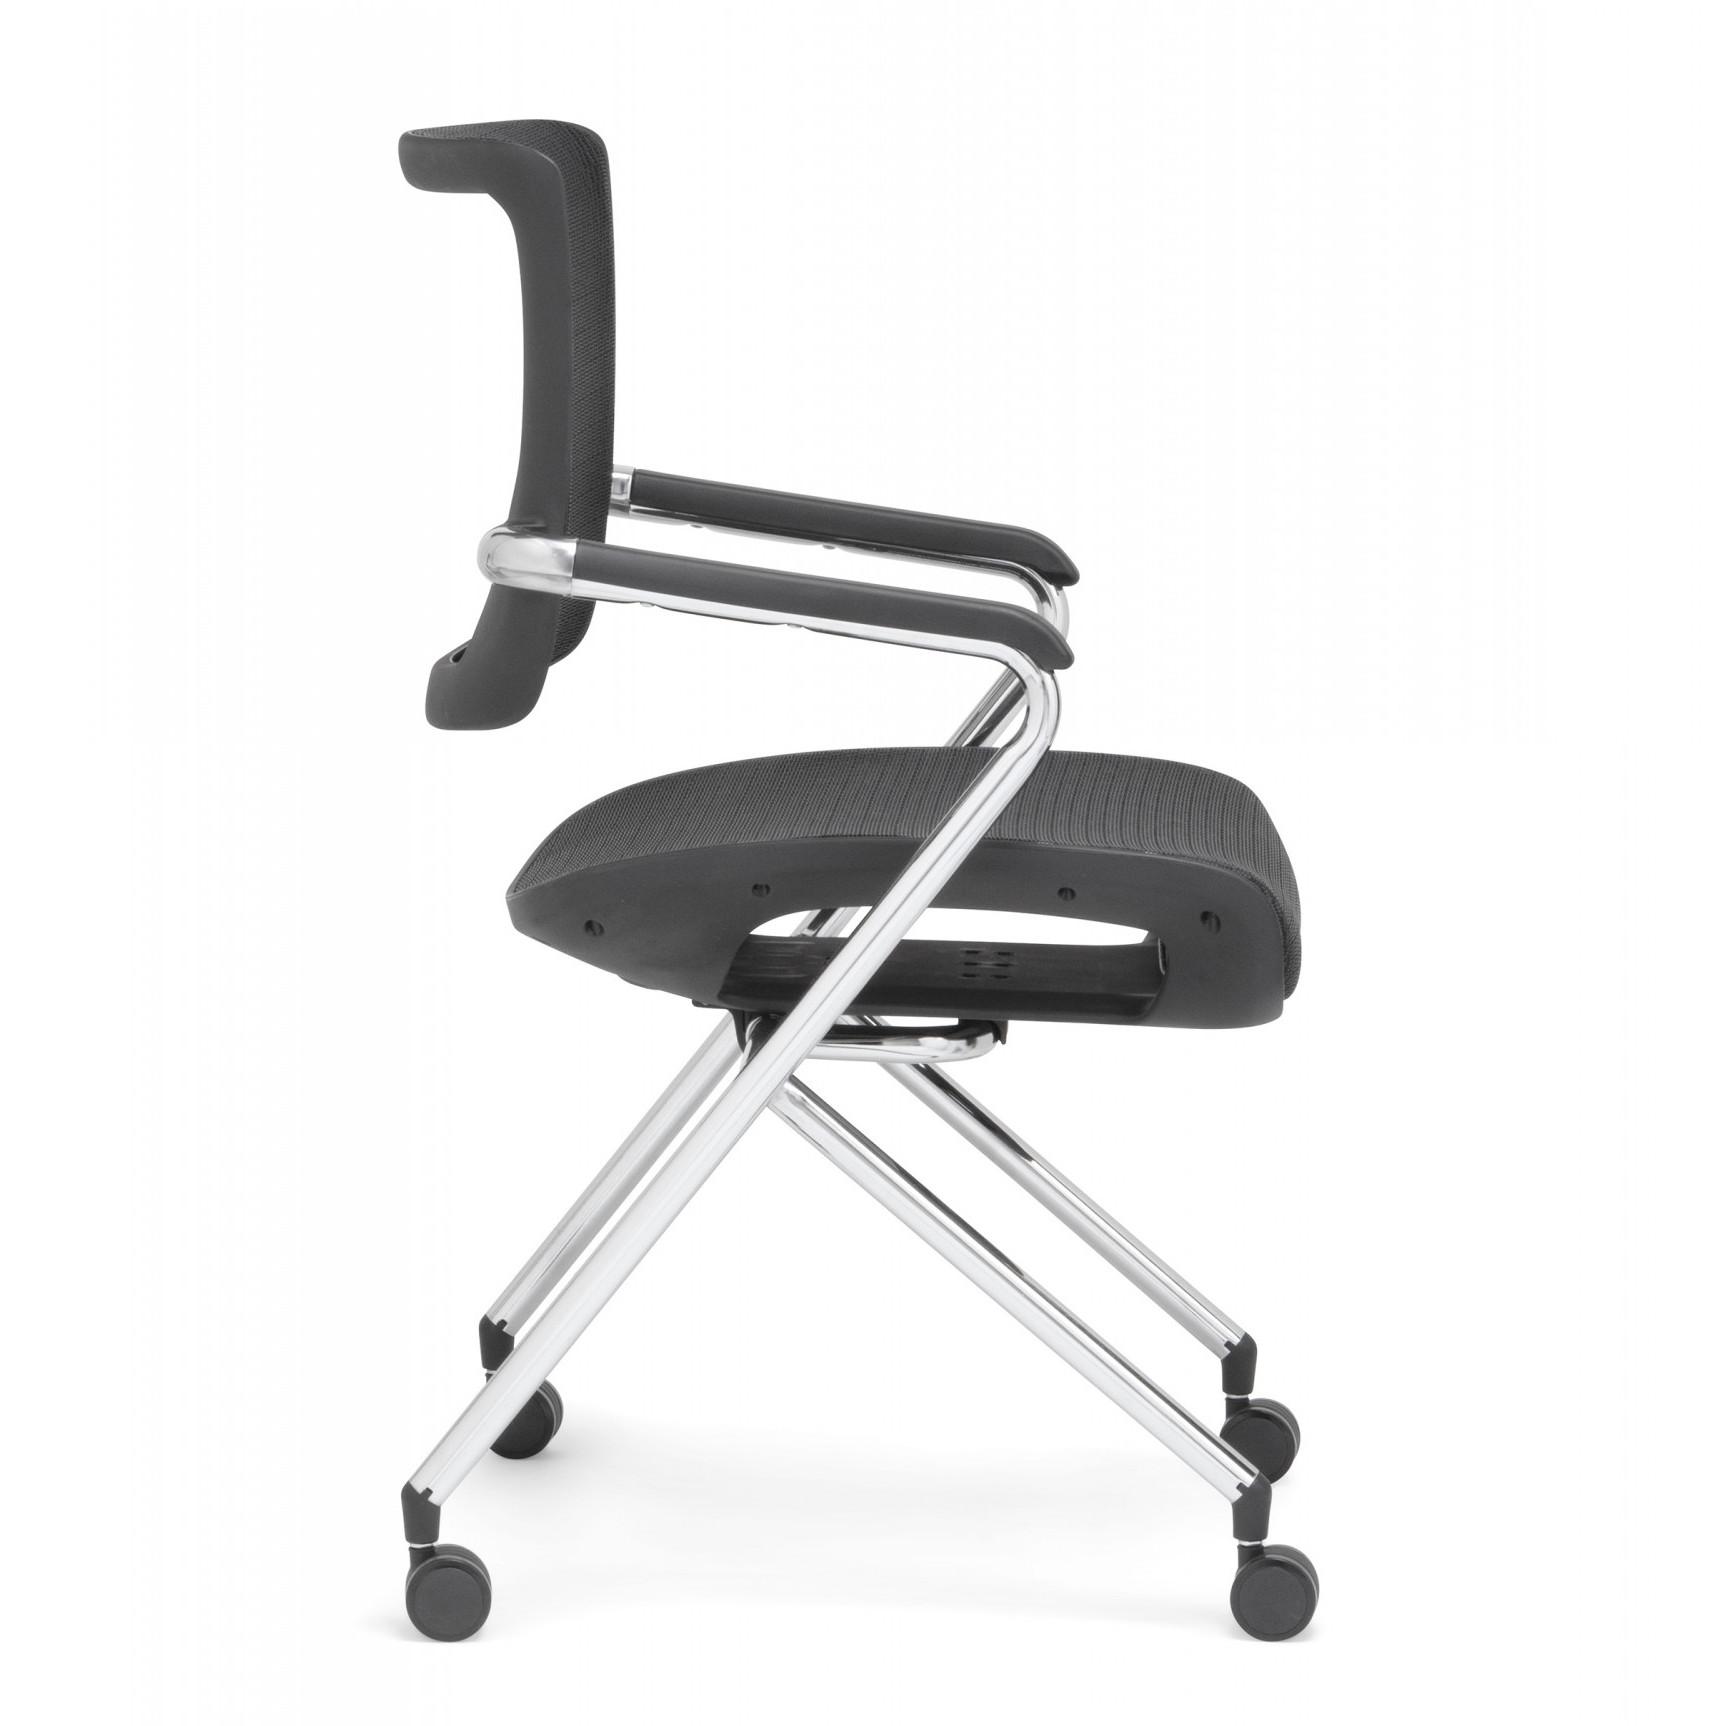 x-chair folding side chair